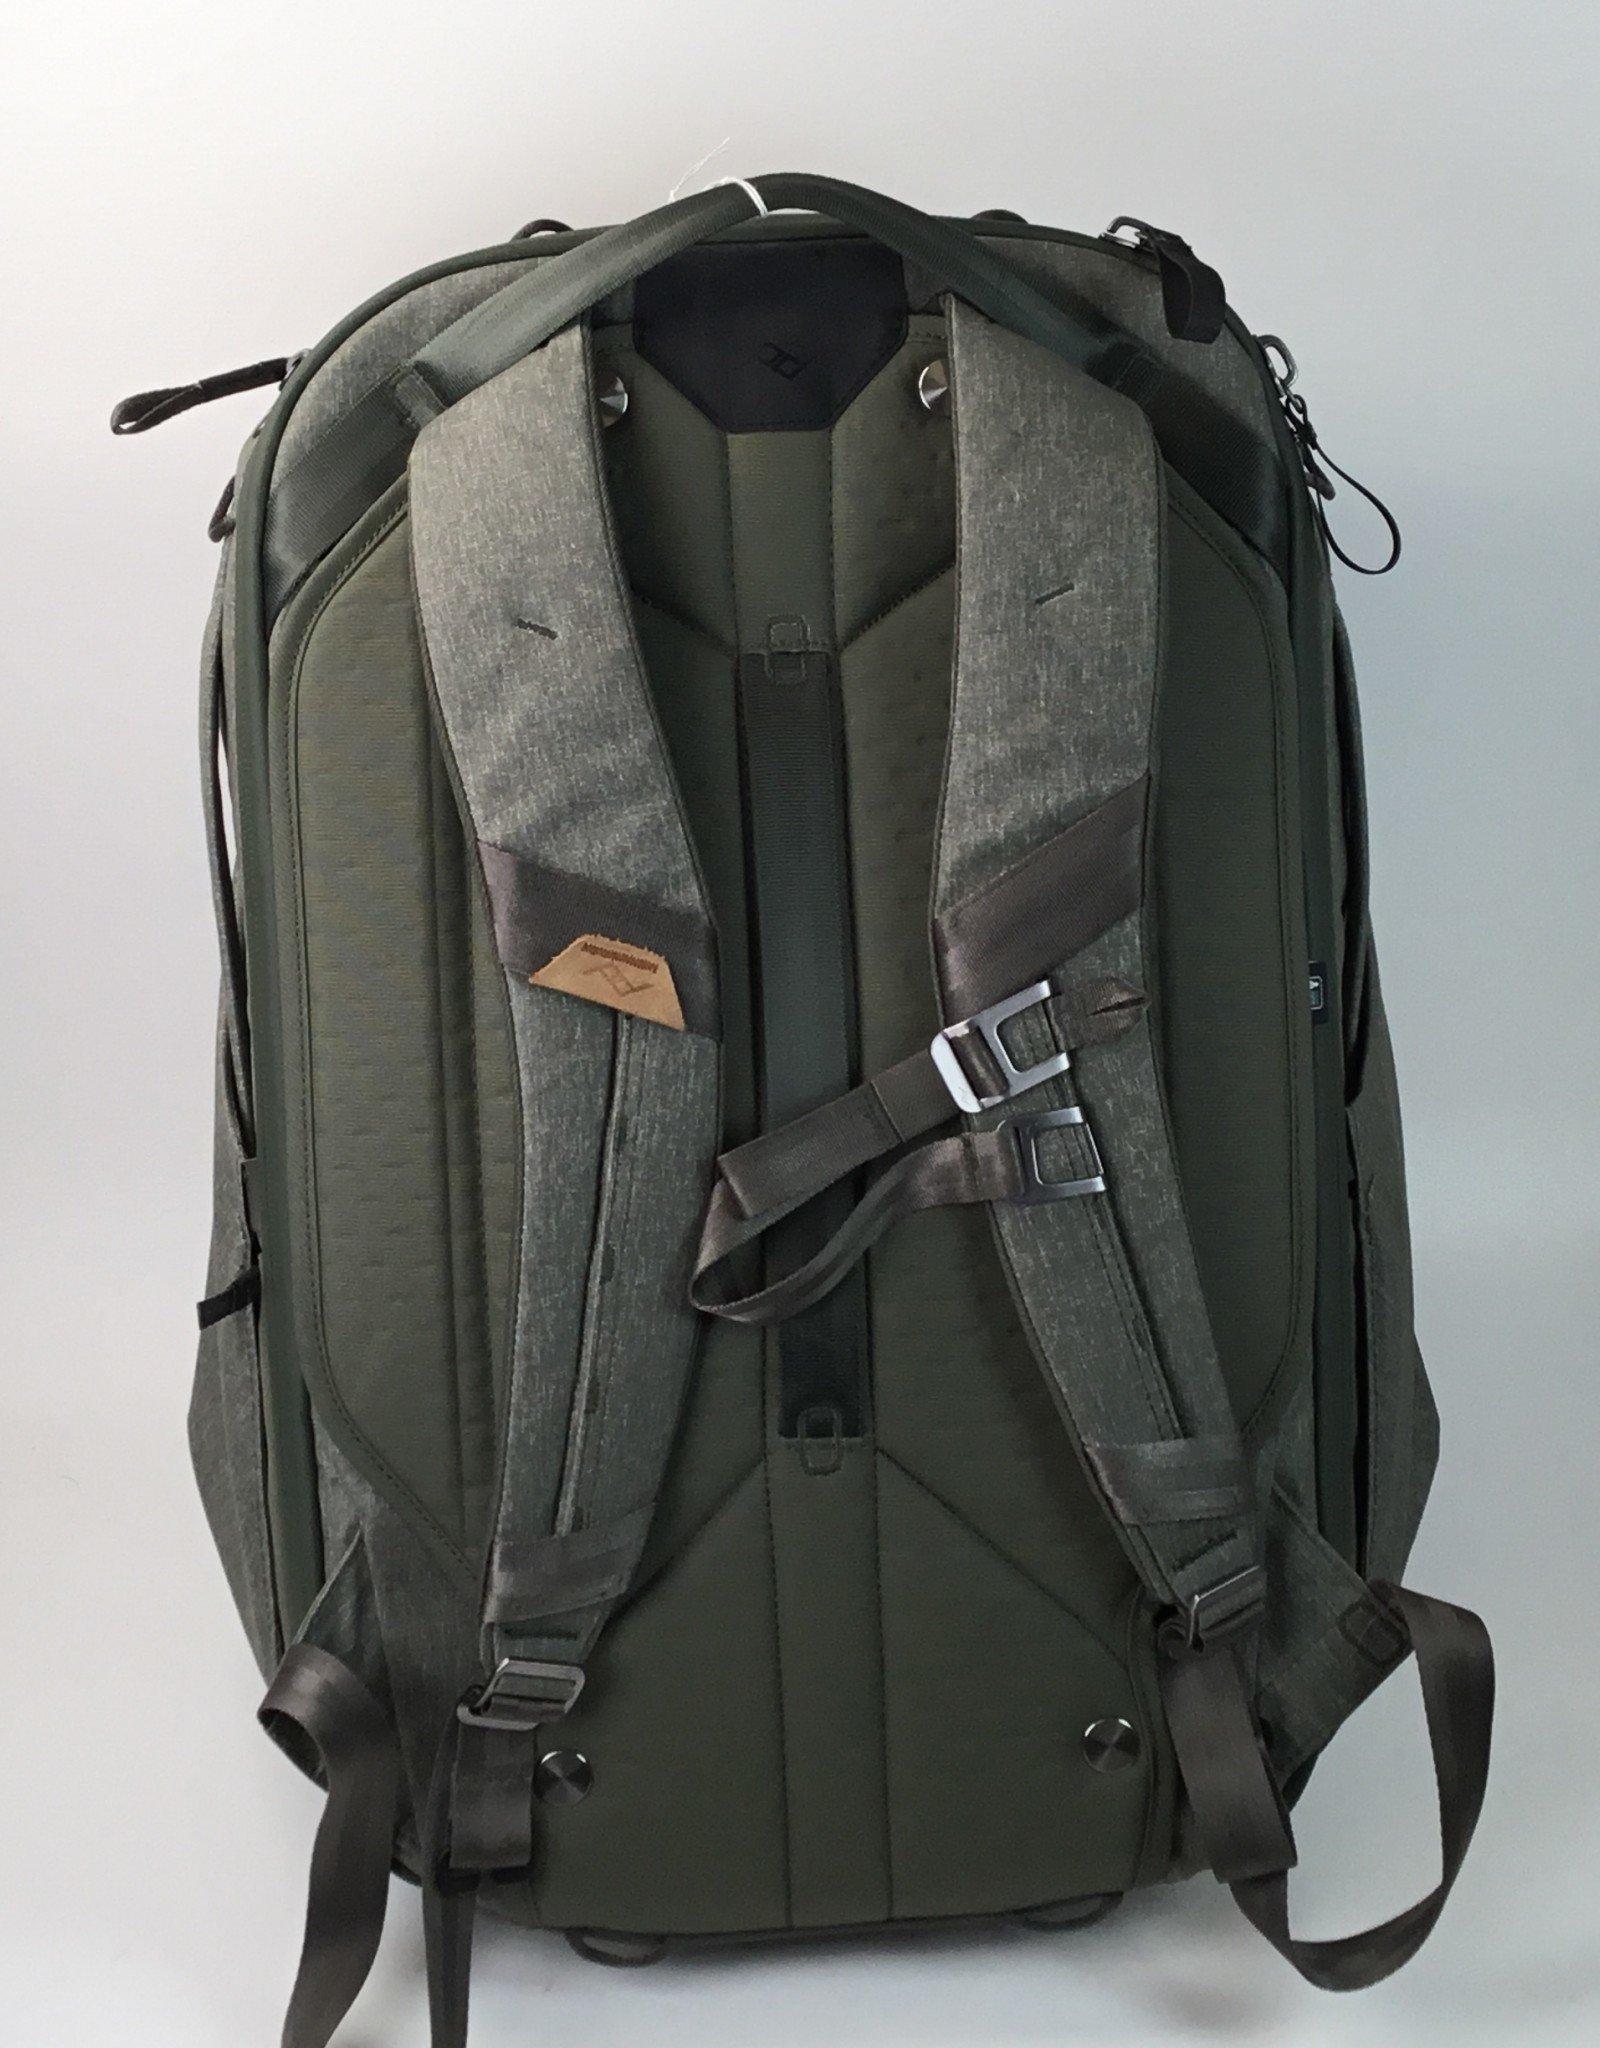 Peak Design Travel Backpack 45L Sage with Large Camera Cube Used EX